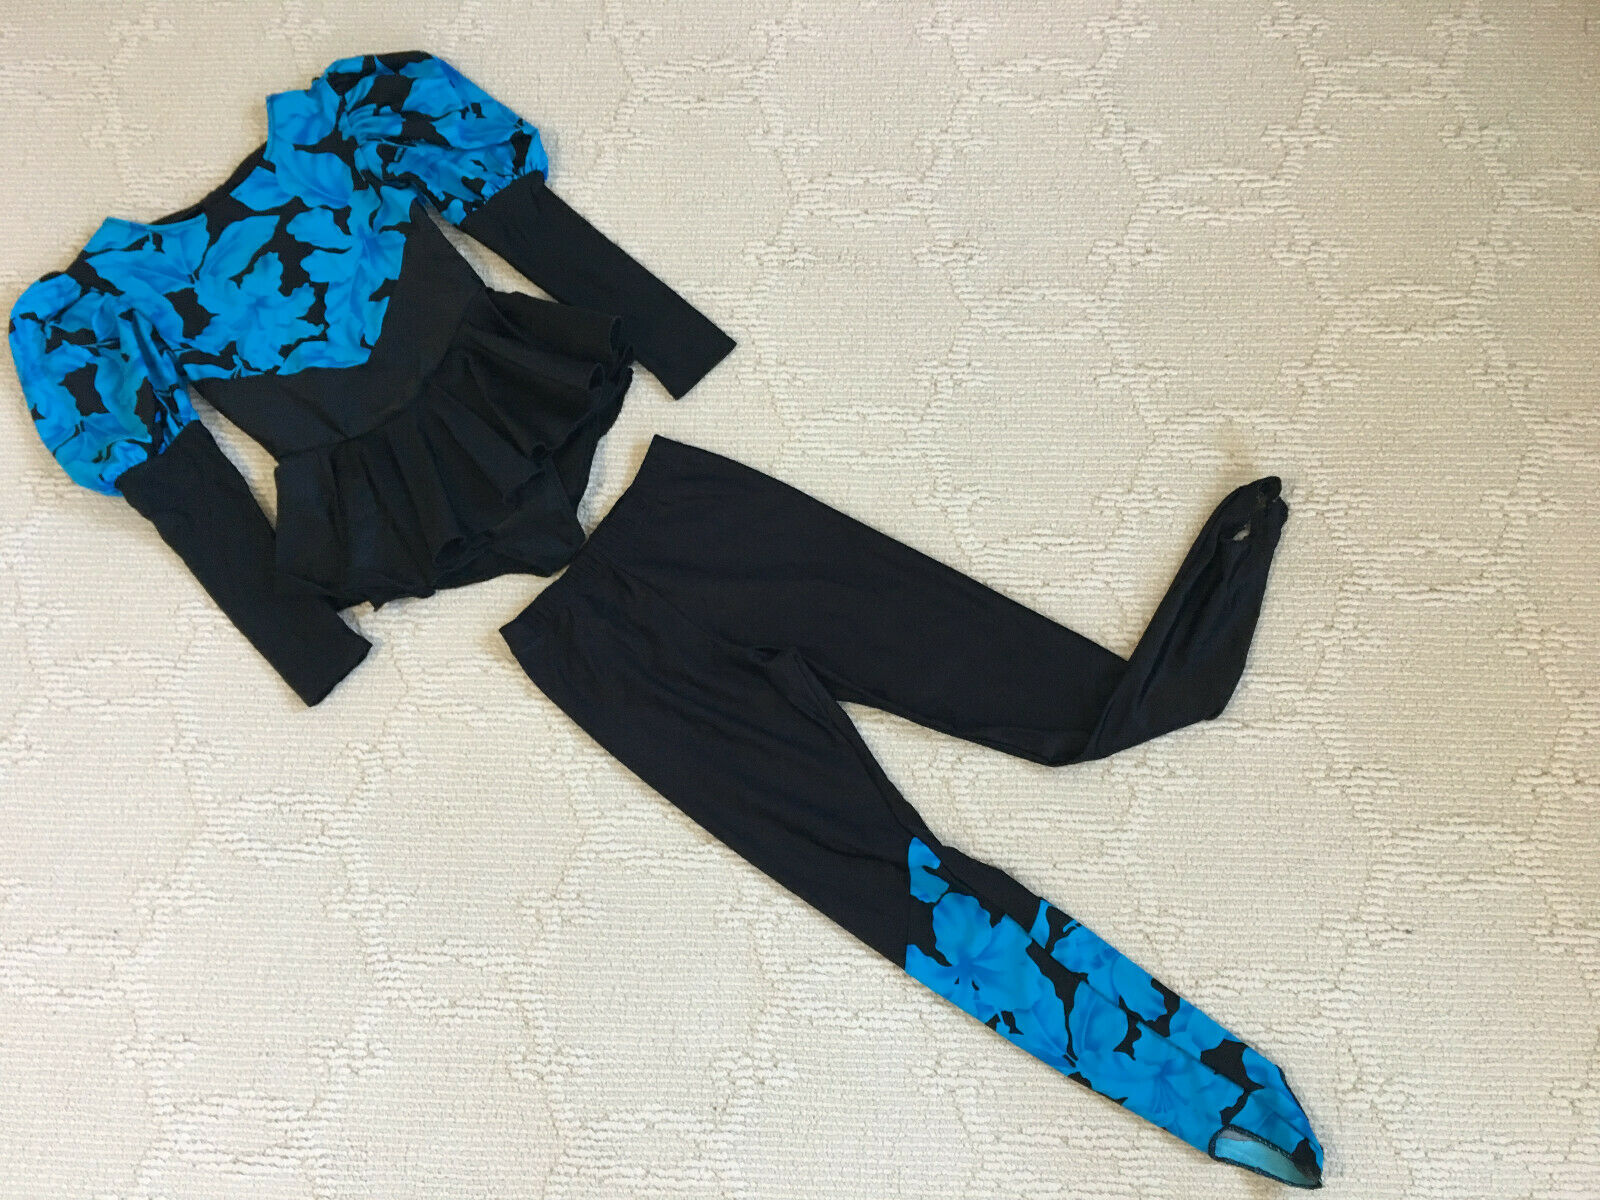 Snowflake Designs Girl Gymnastics Leotard Leggings Set bluee Floral Size  M (8)  convenient